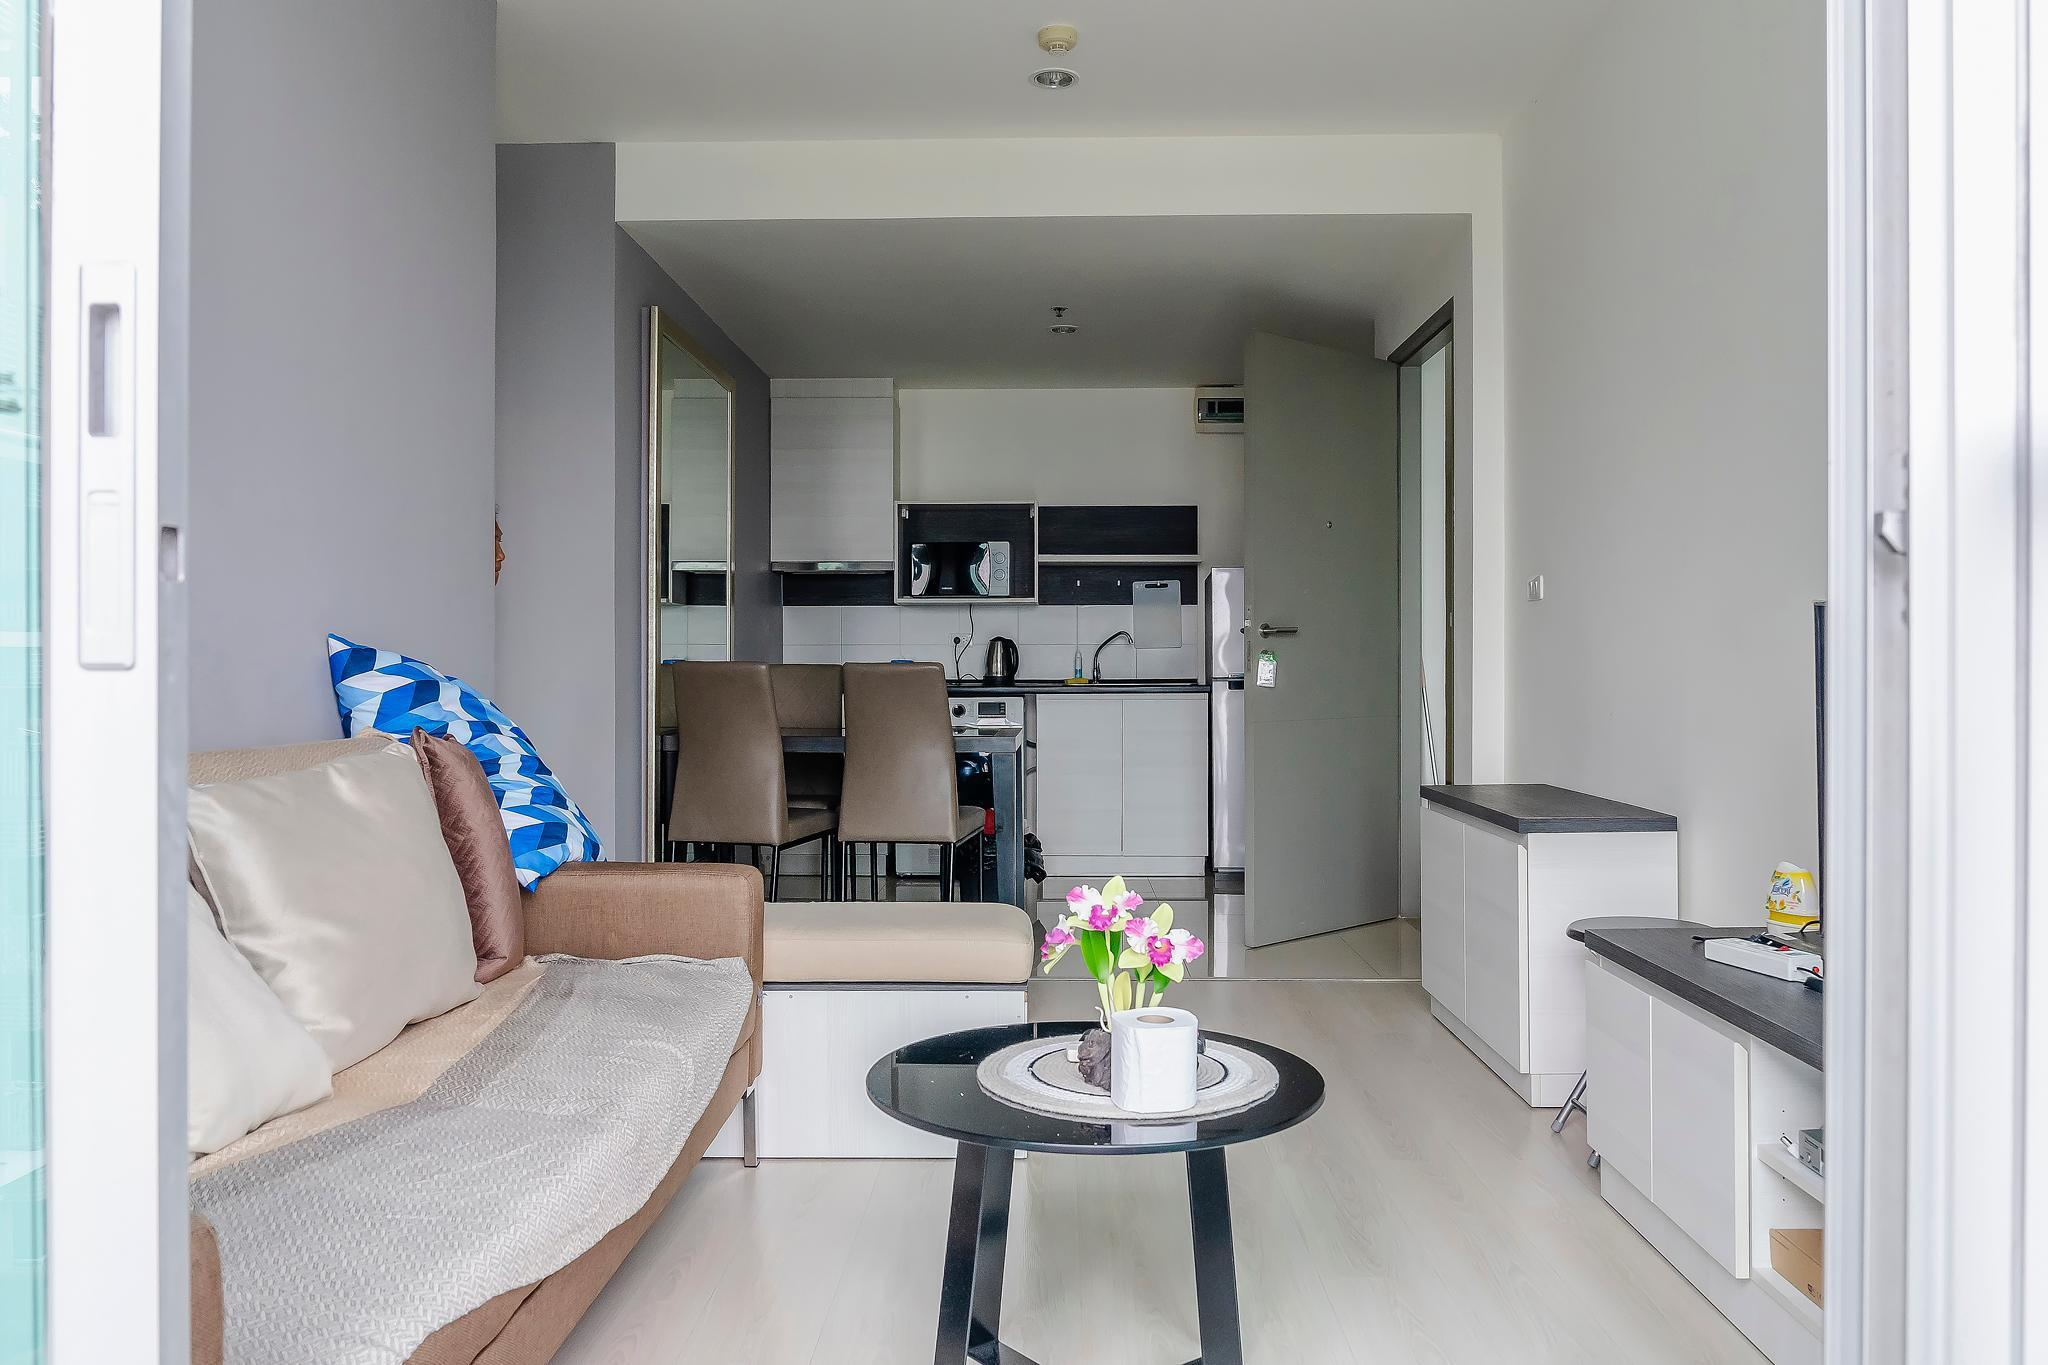 SKX&Luxury family room อพาร์ตเมนต์ 2 ห้องนอน 2 ห้องน้ำส่วนตัว ขนาด 60 ตร.ม. – รัชดาภิเษก